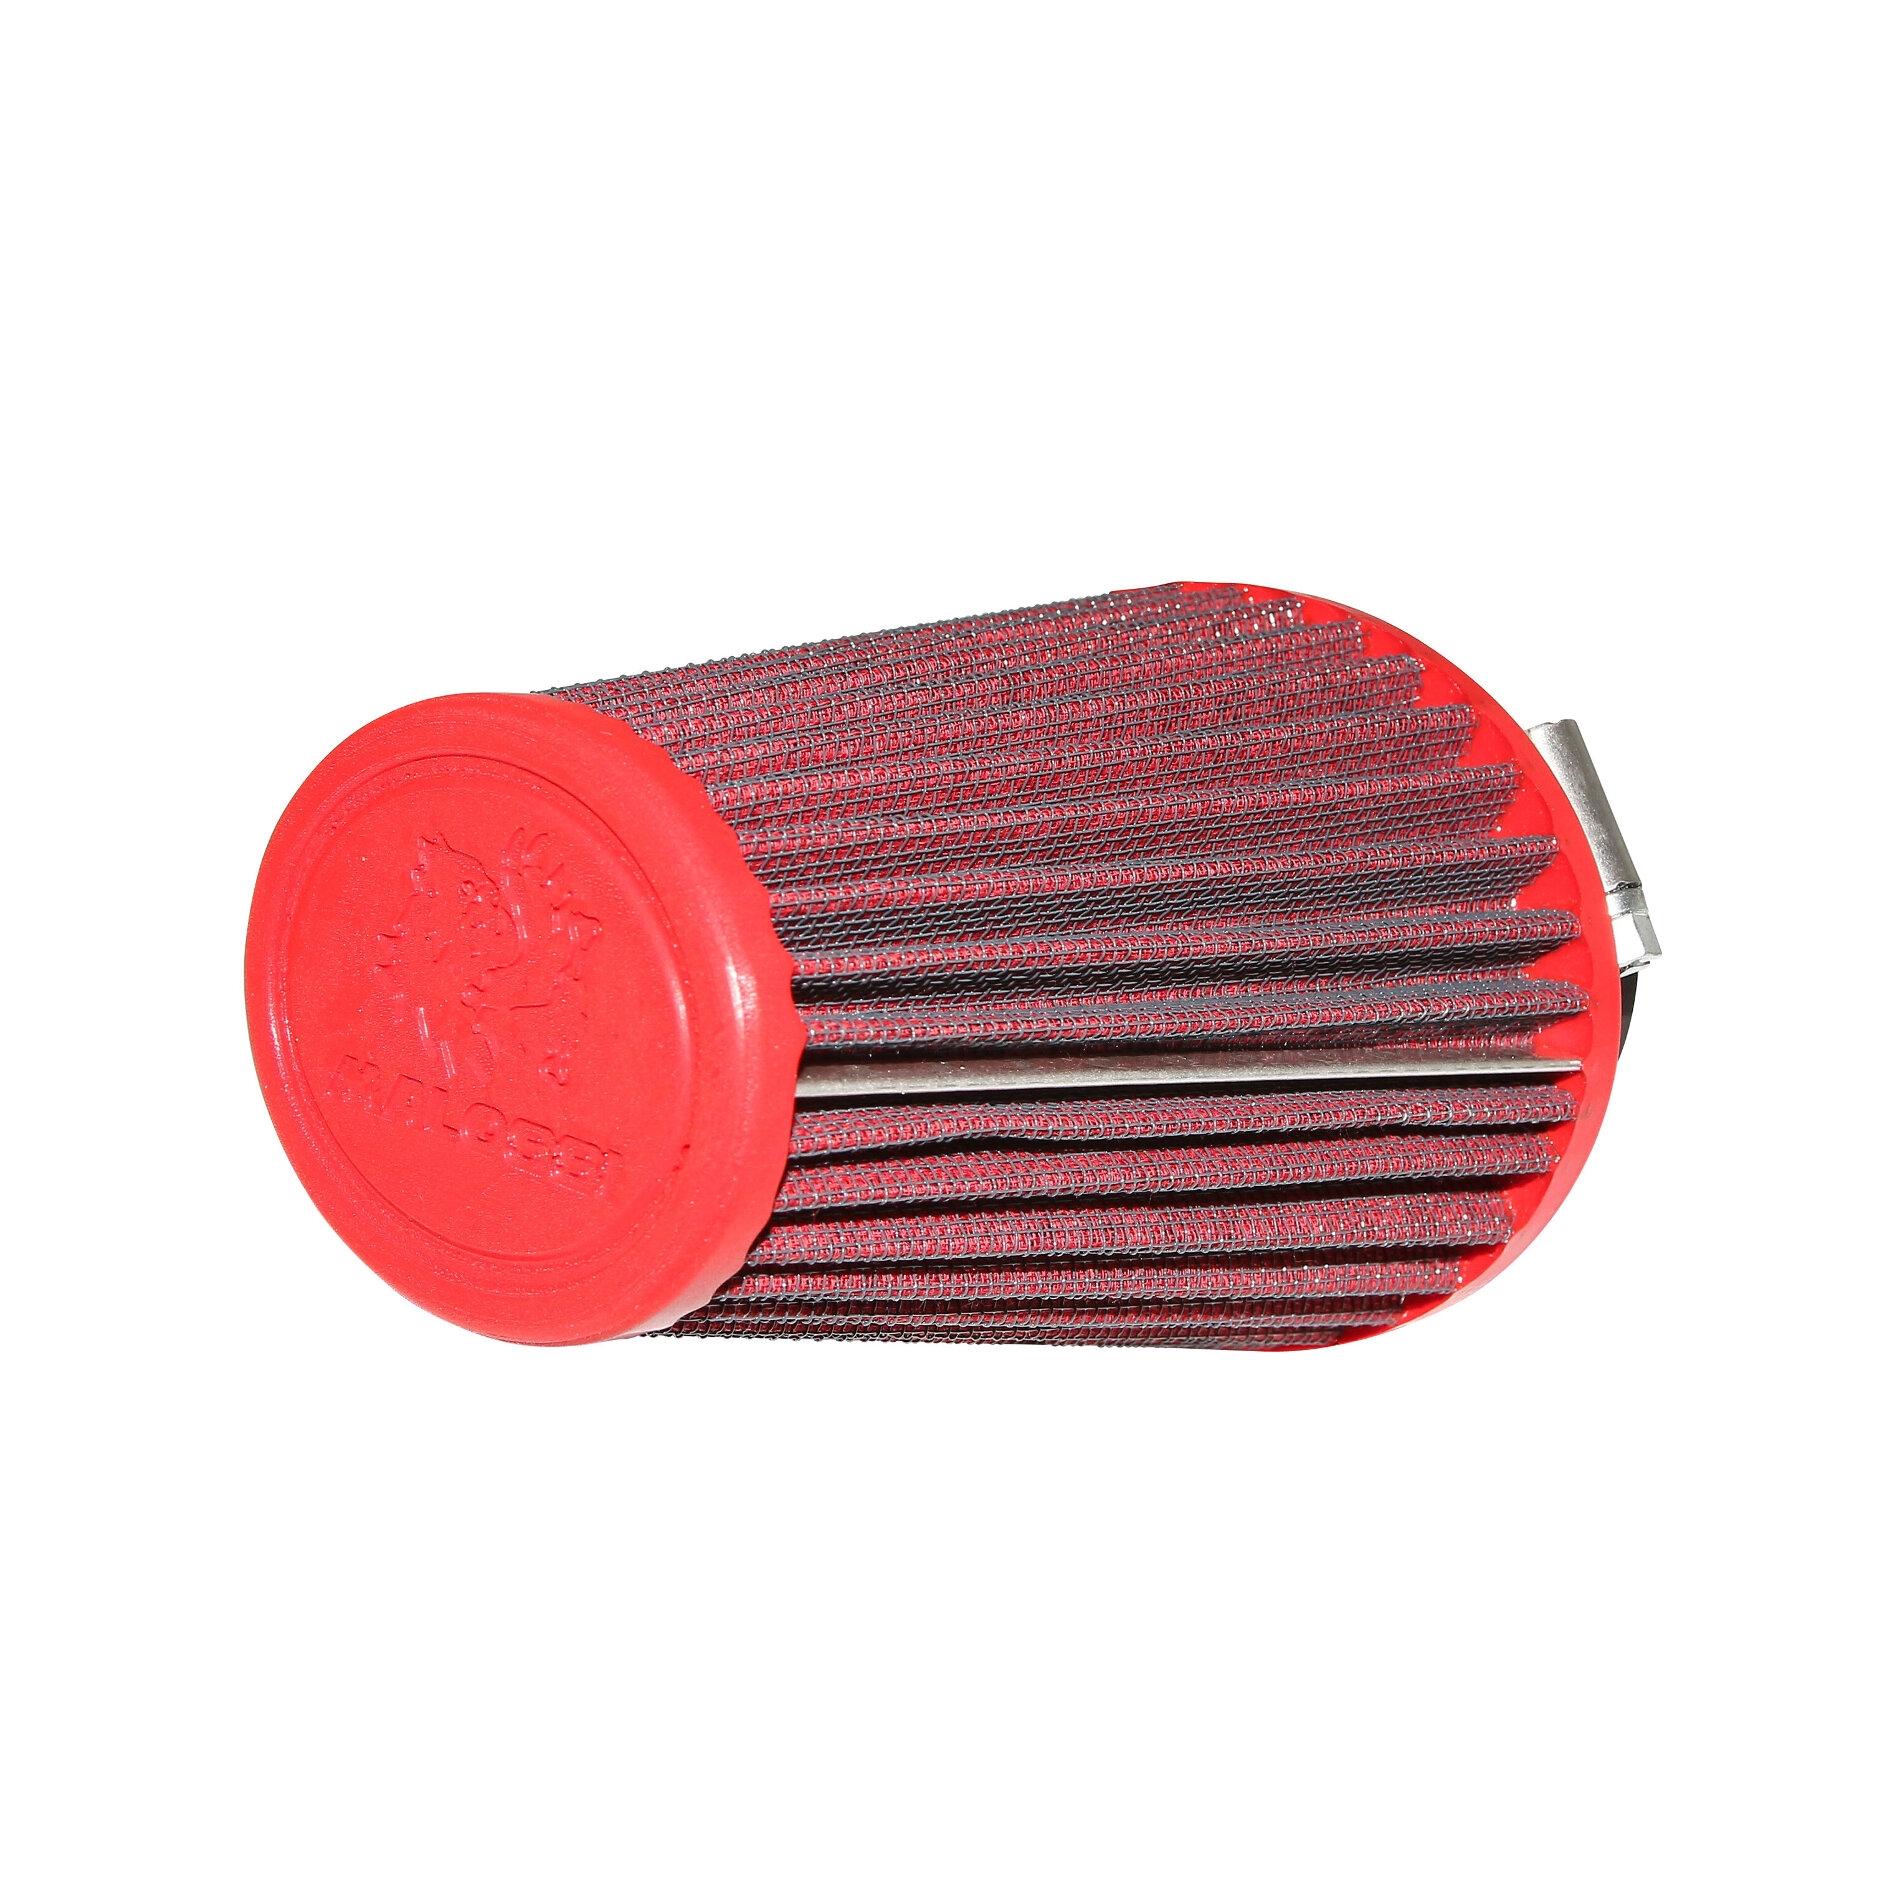 Filtre à air Malossi Red Filter E18 D.60 x 125 mm PHBG/PHBL